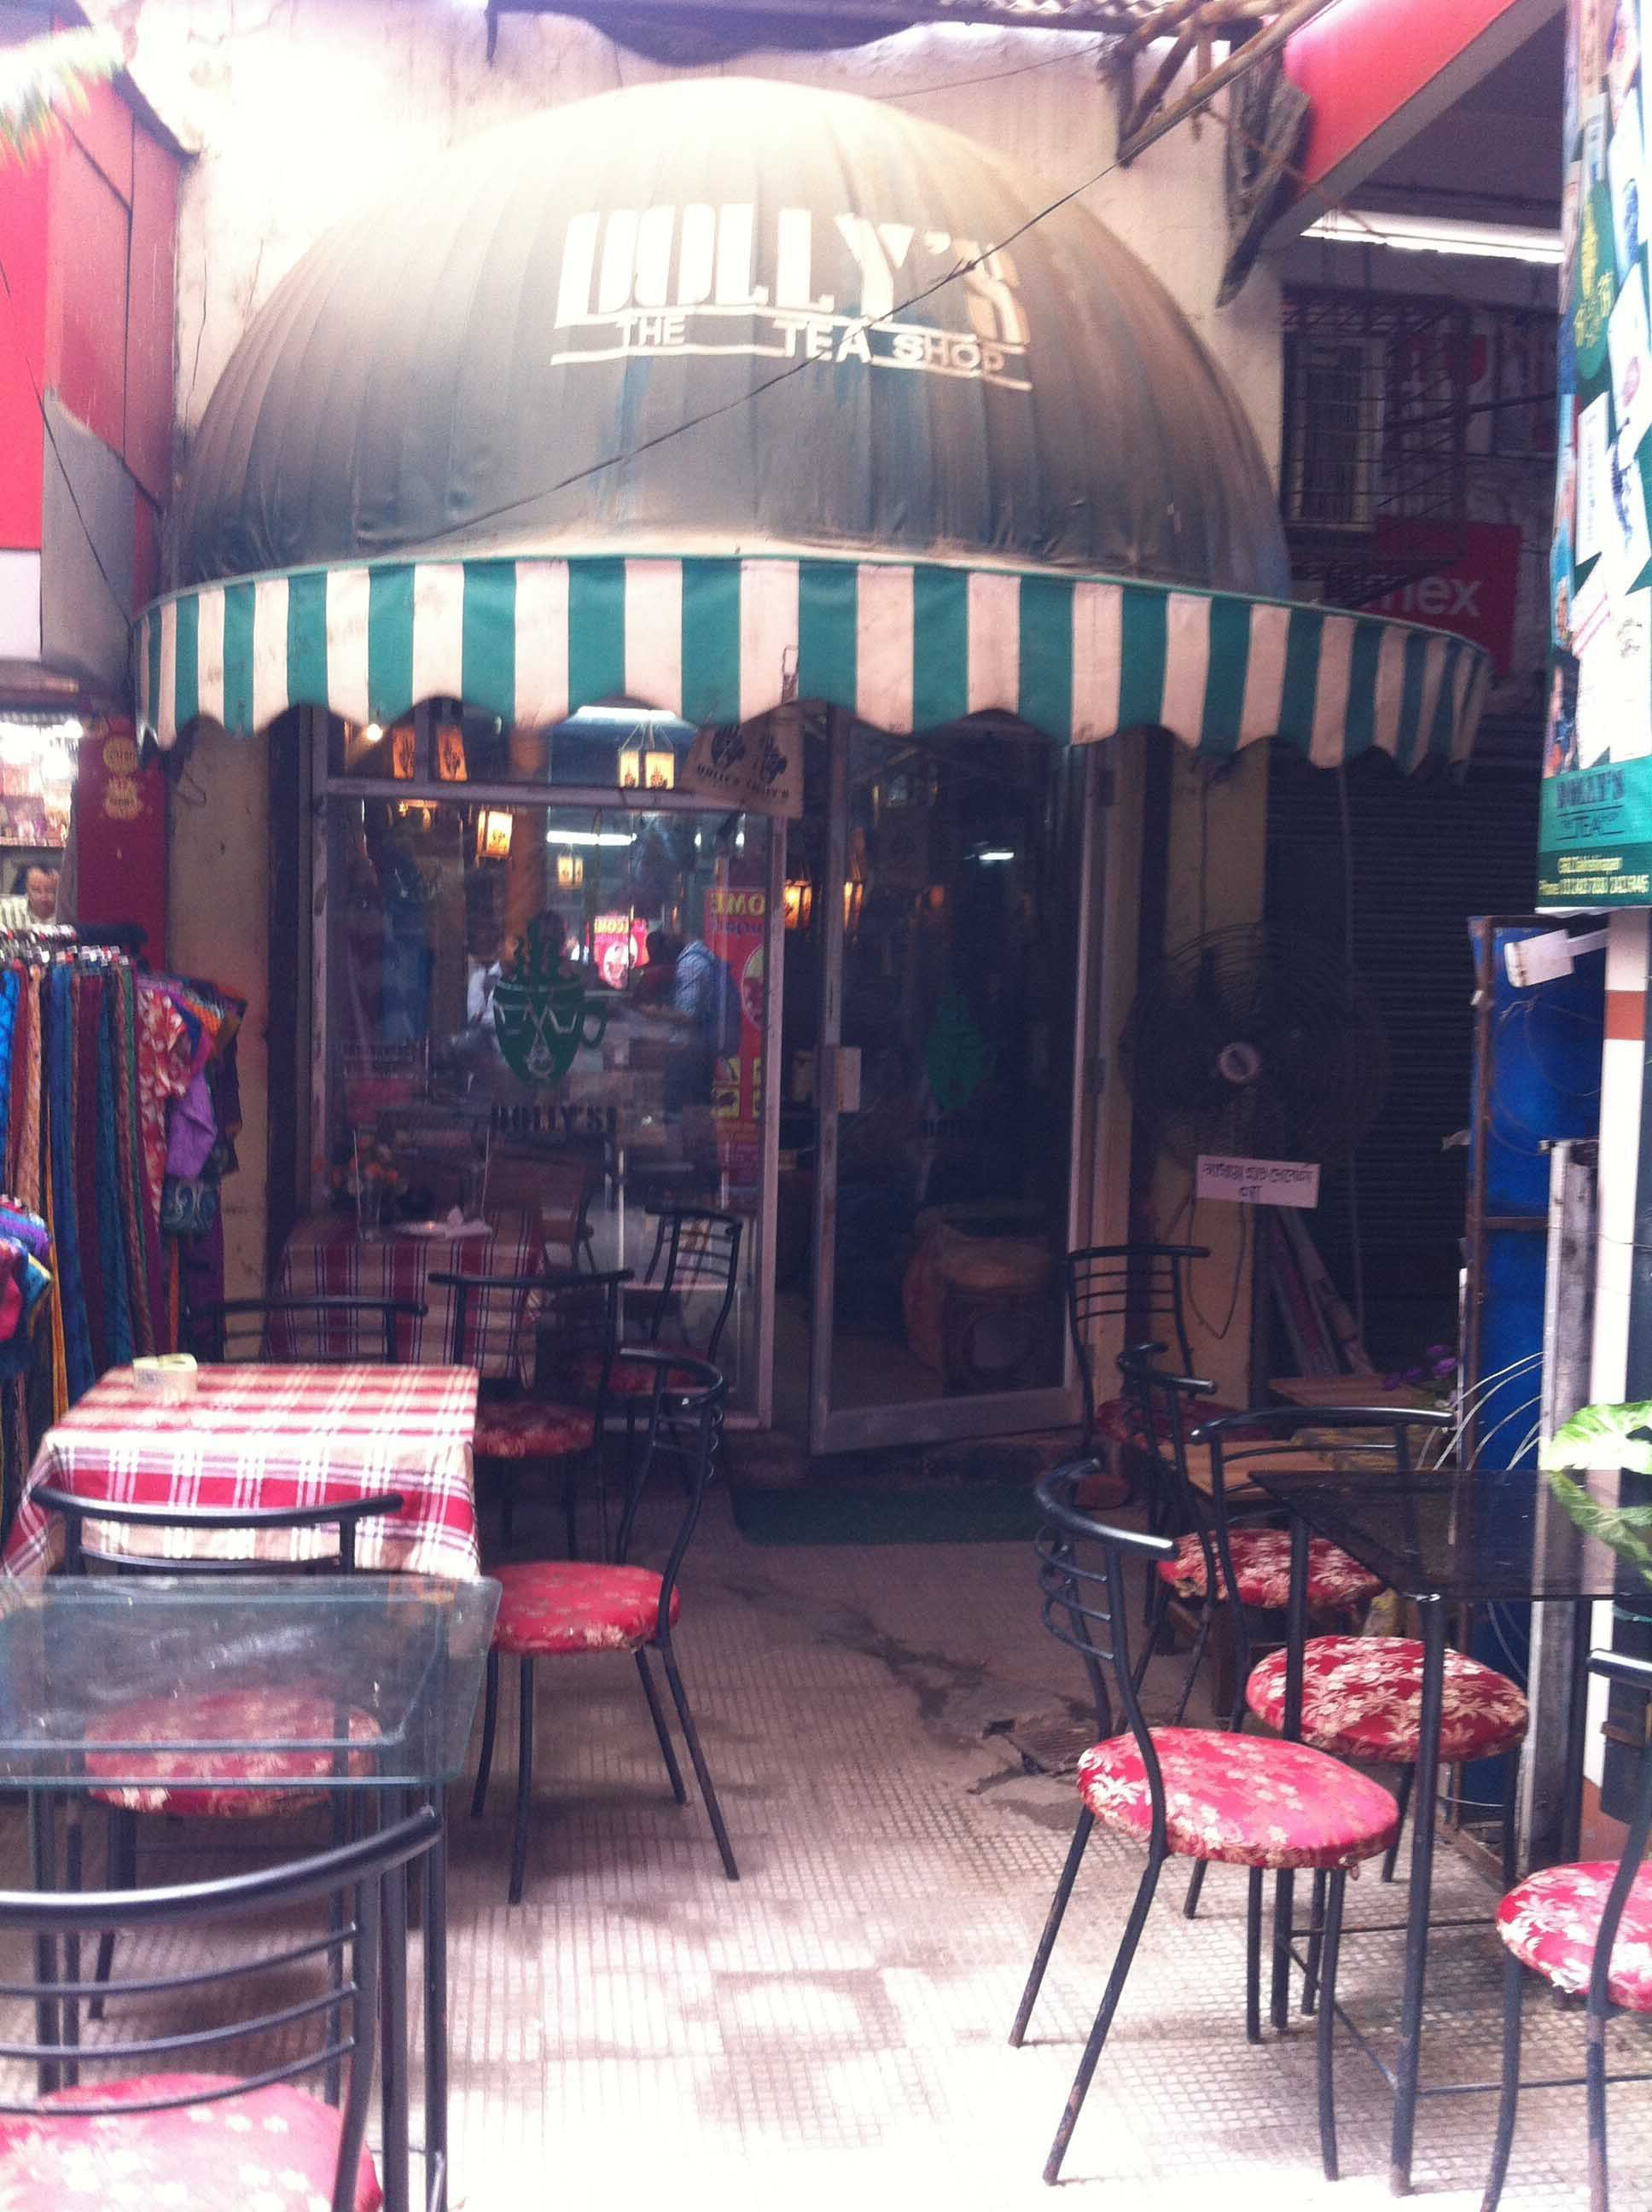 Dolly's The Tea Shop - Dhakuria - Kolkata Image